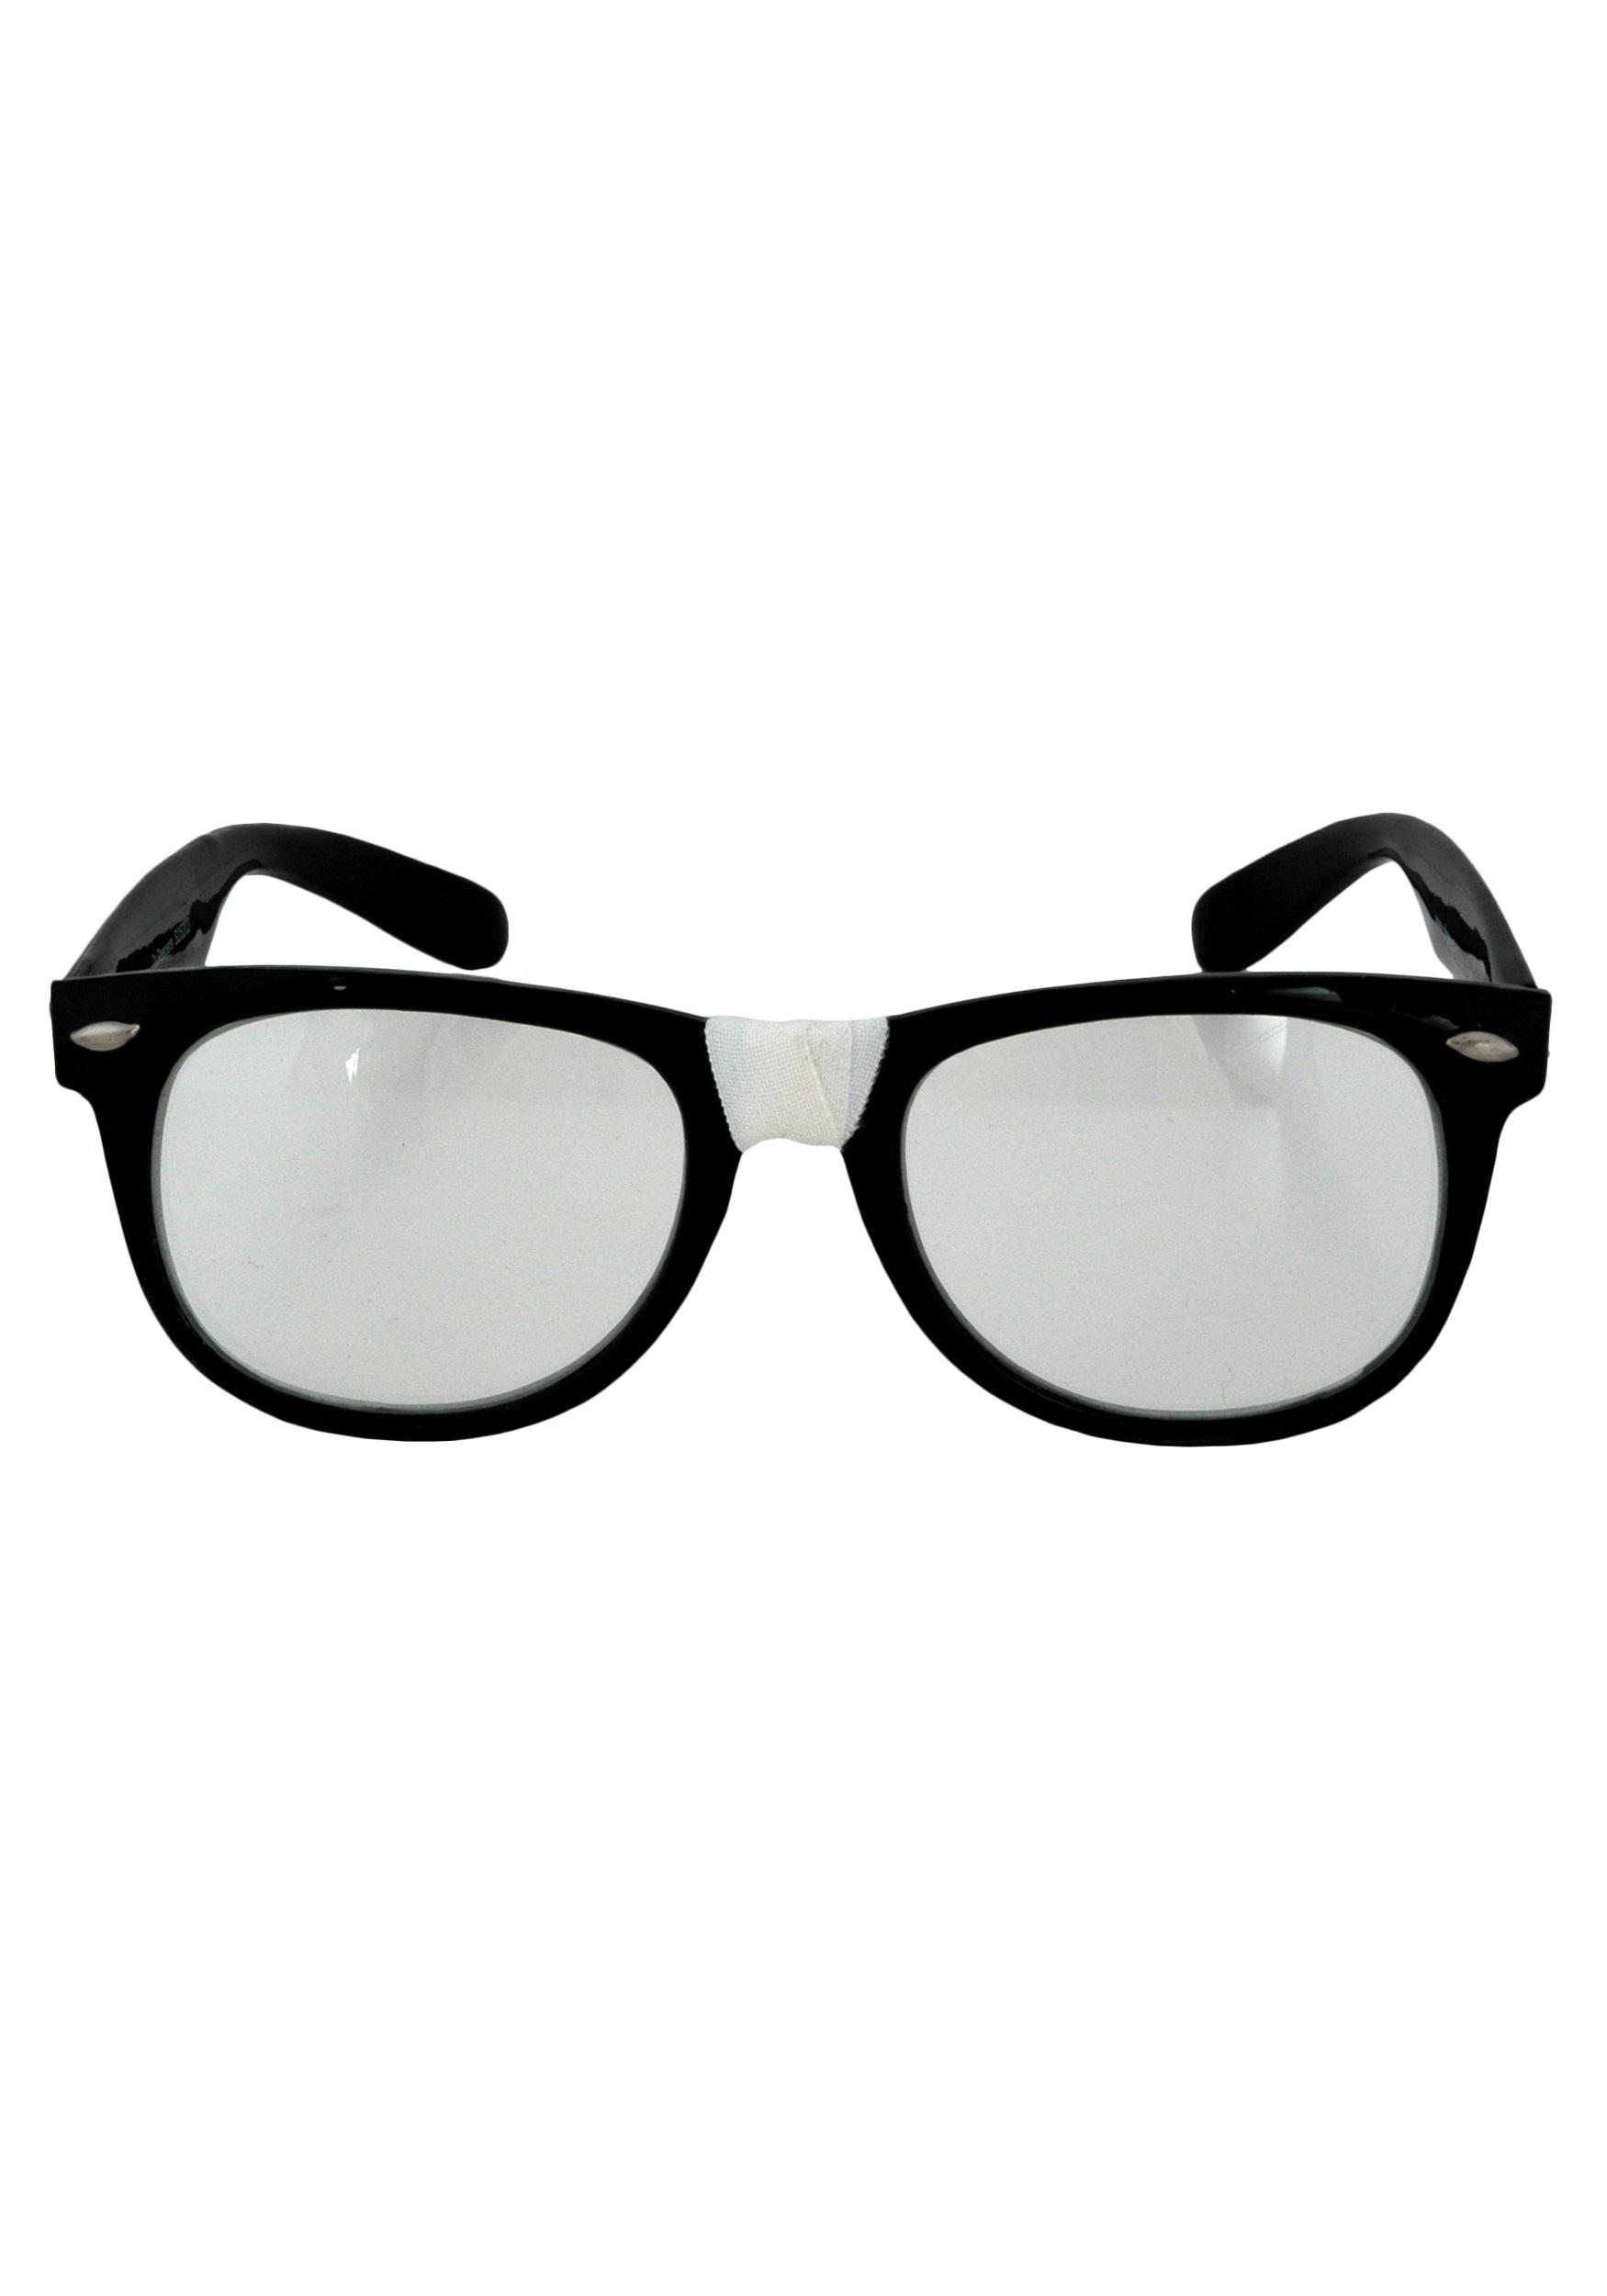 Geek clipart nerd glass Glasses Nerd Sunglasses Glasses Glasses